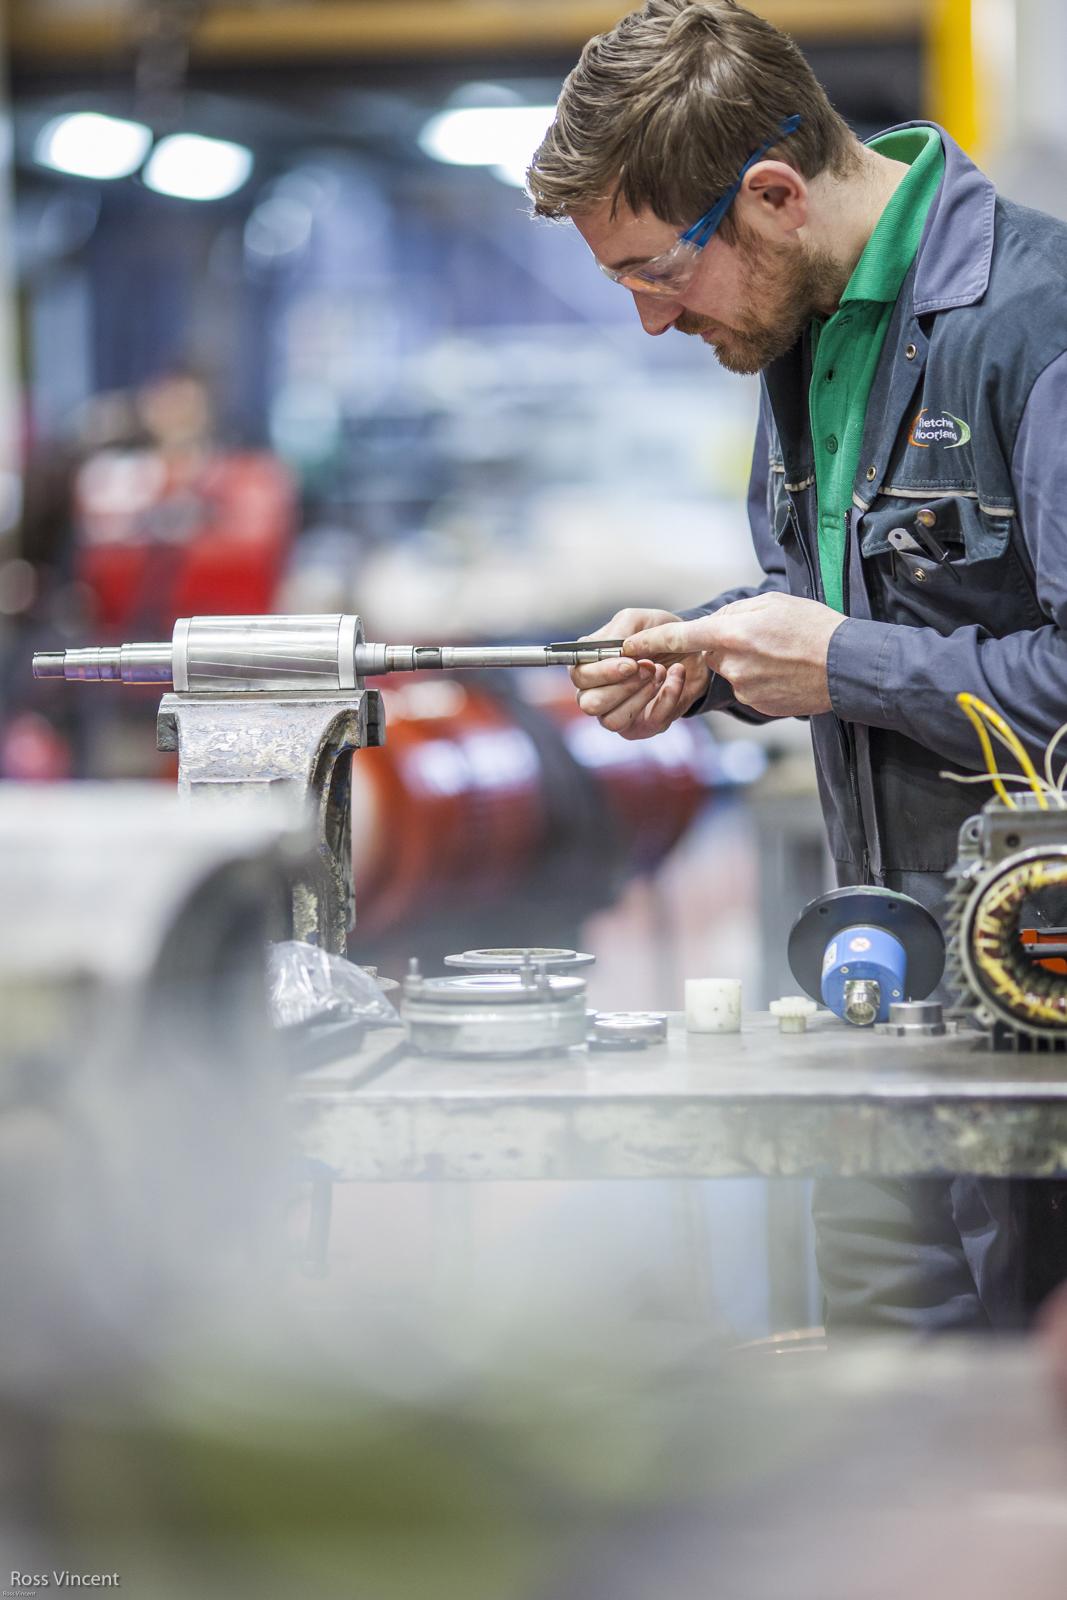 electrical motor repair for Fletcher Moorland of stoke on Trent